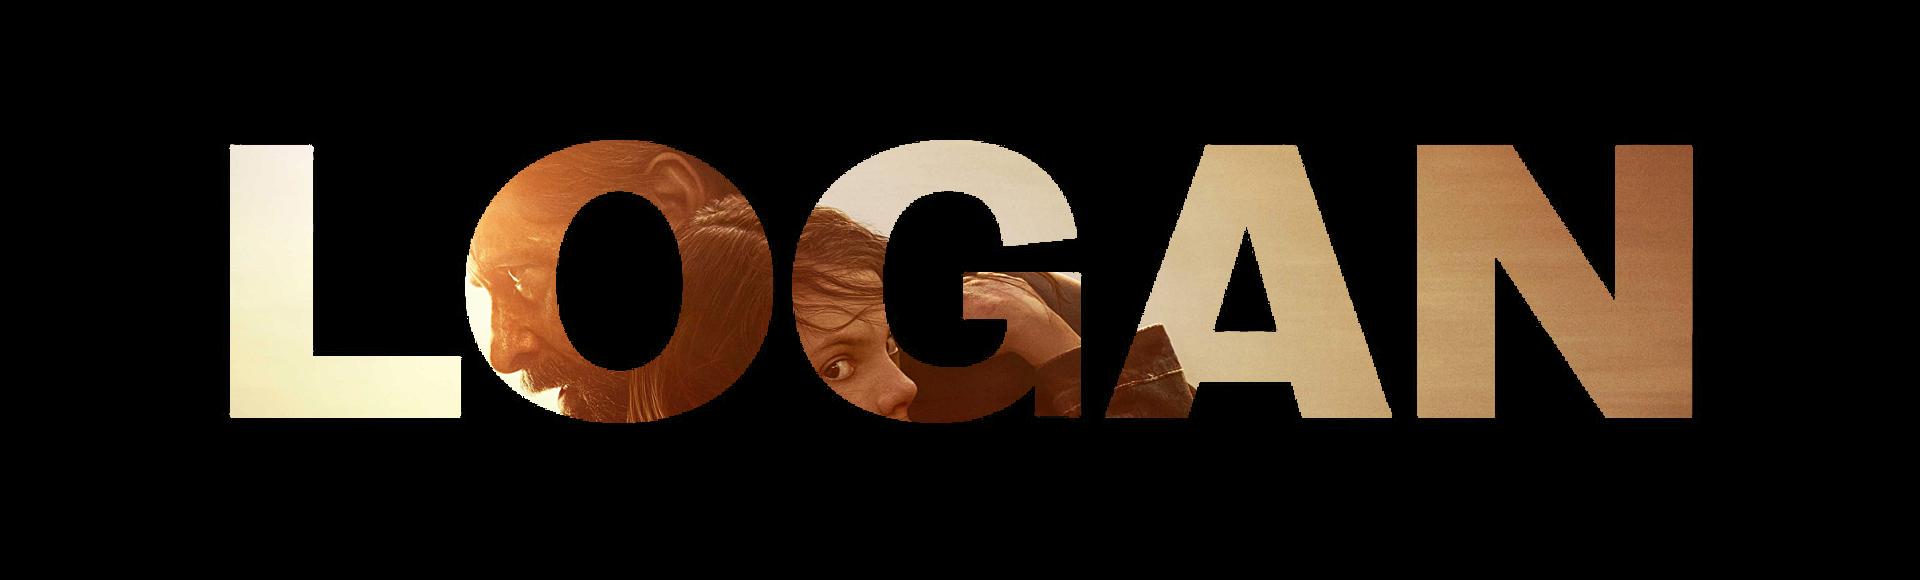 Logan: l'eroico congedo di una saga